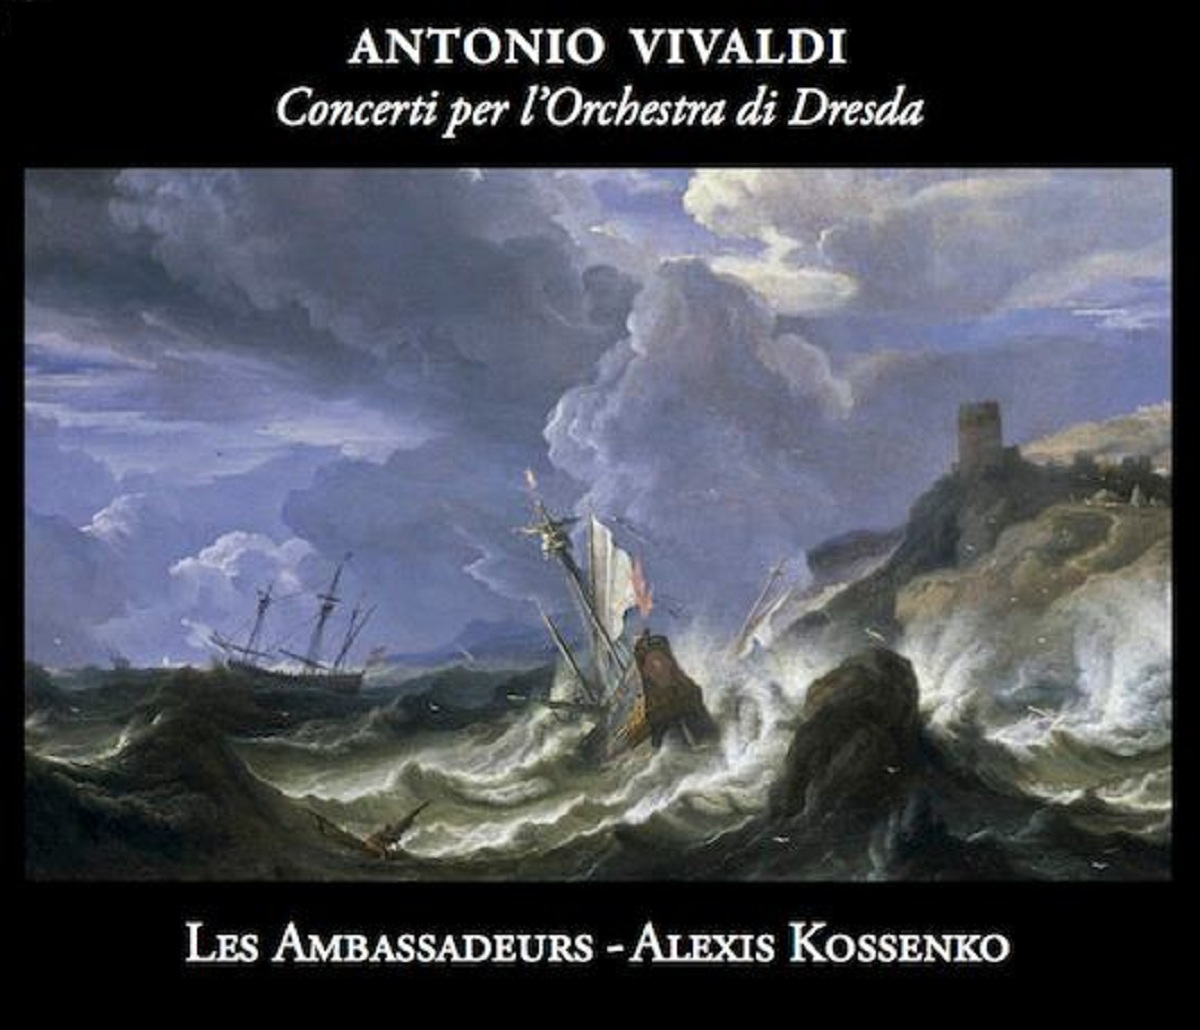 """Antonio Vivaldi Concerti per l'orchestra di Dresda"" Les Ambassadeurs, okładka (źródło: mat. prasowe)"